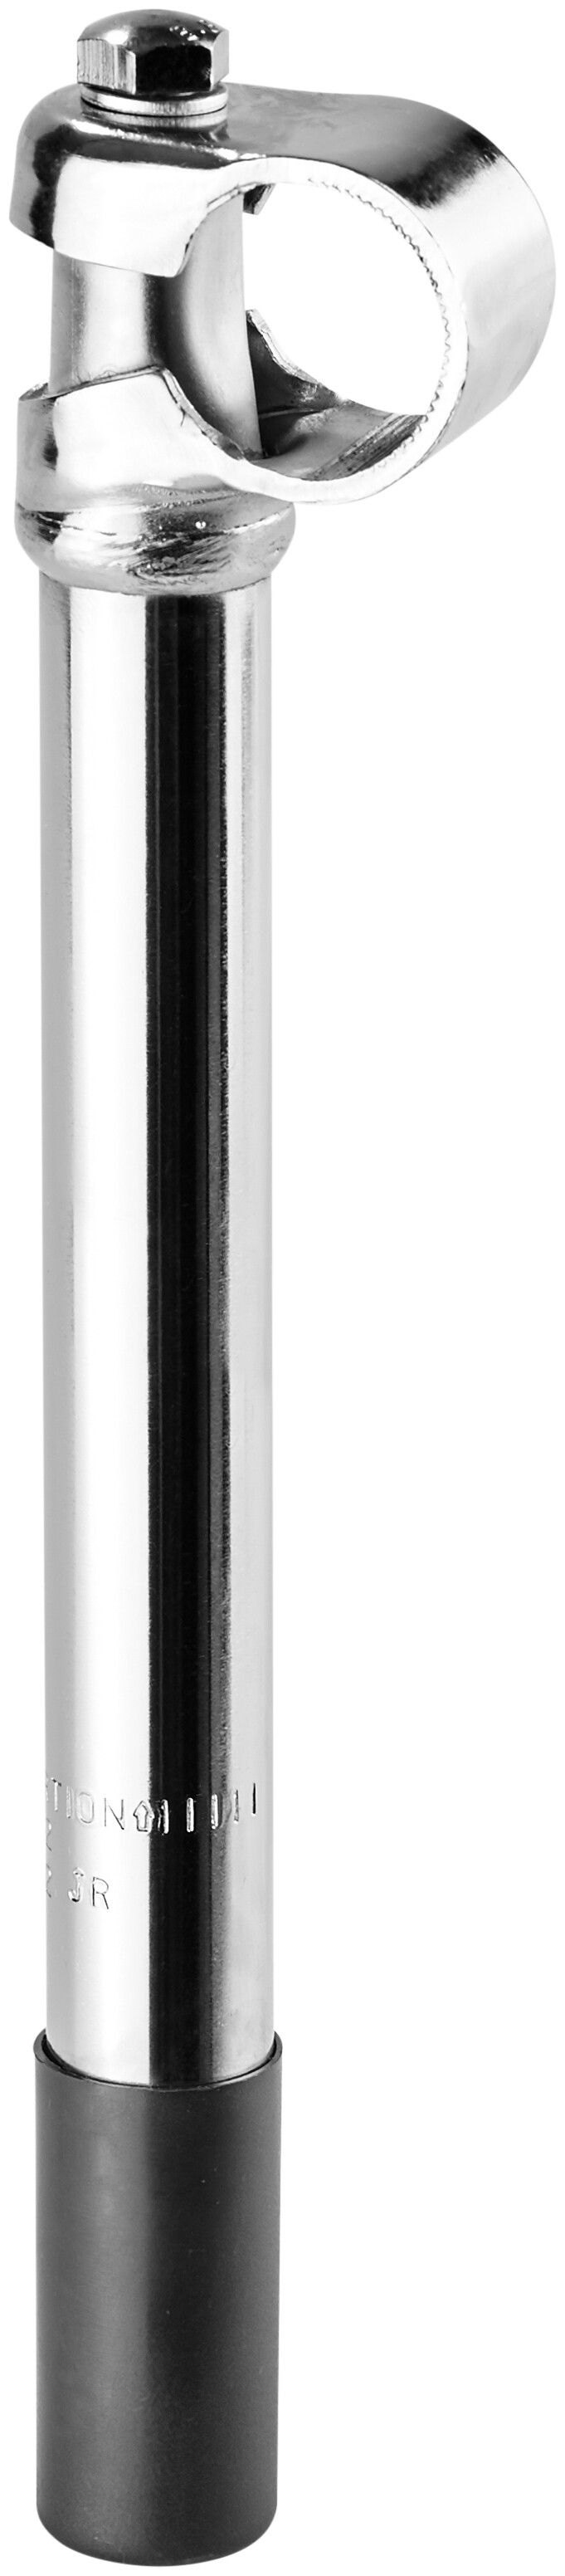 Fahrrad Klemmvorbau Ergotec verchromt Ø = 25,4//22,2 mm L = 400//20 mm Stahl